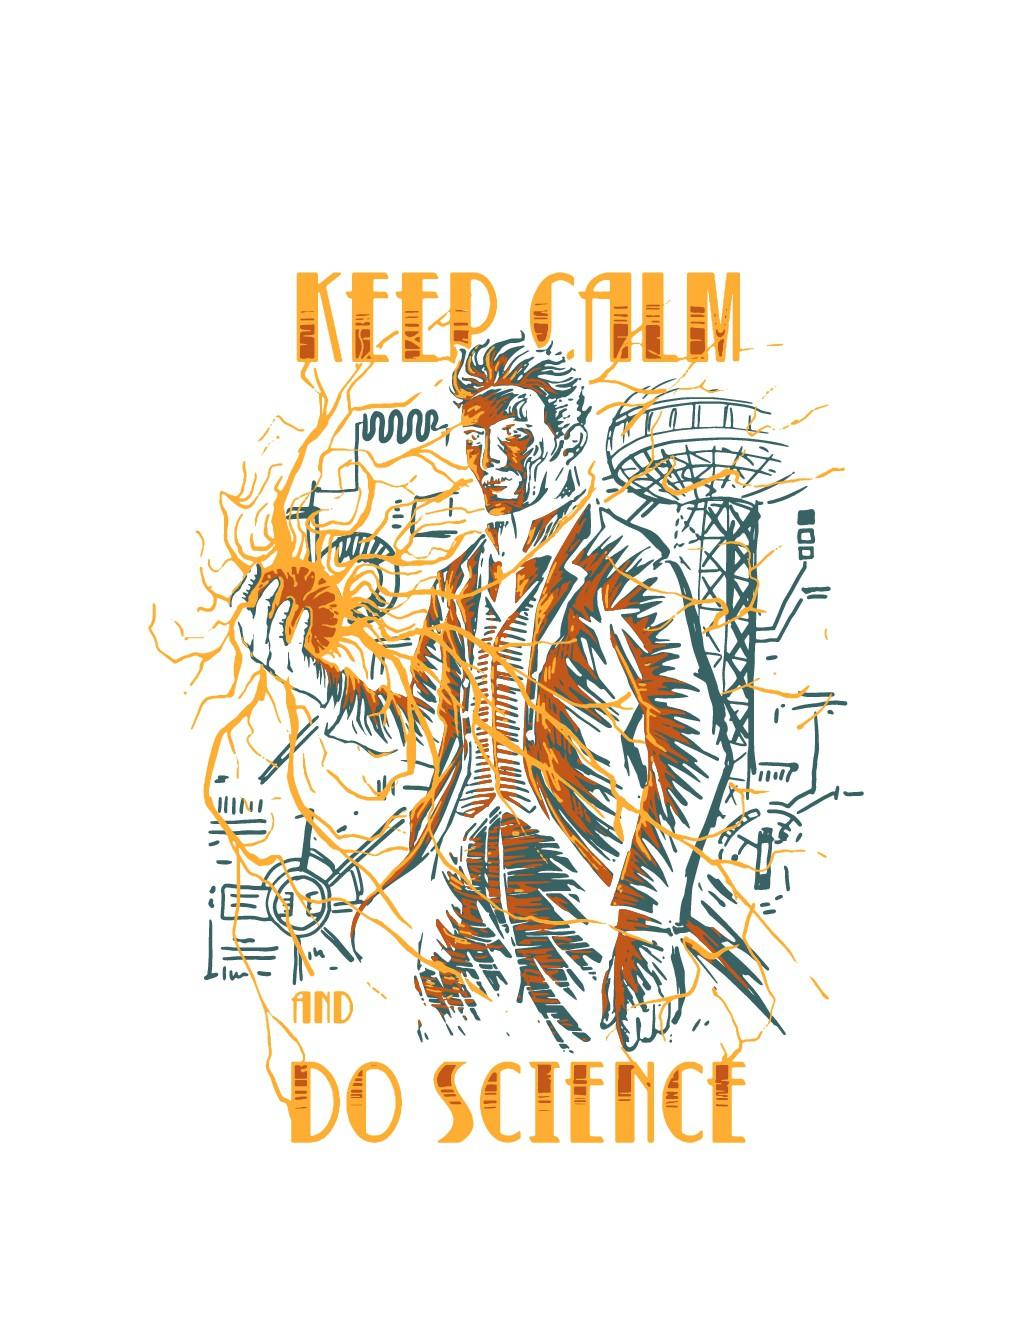 T-Shirt to inspire achievers: inventors, scientists, entrepreneurs